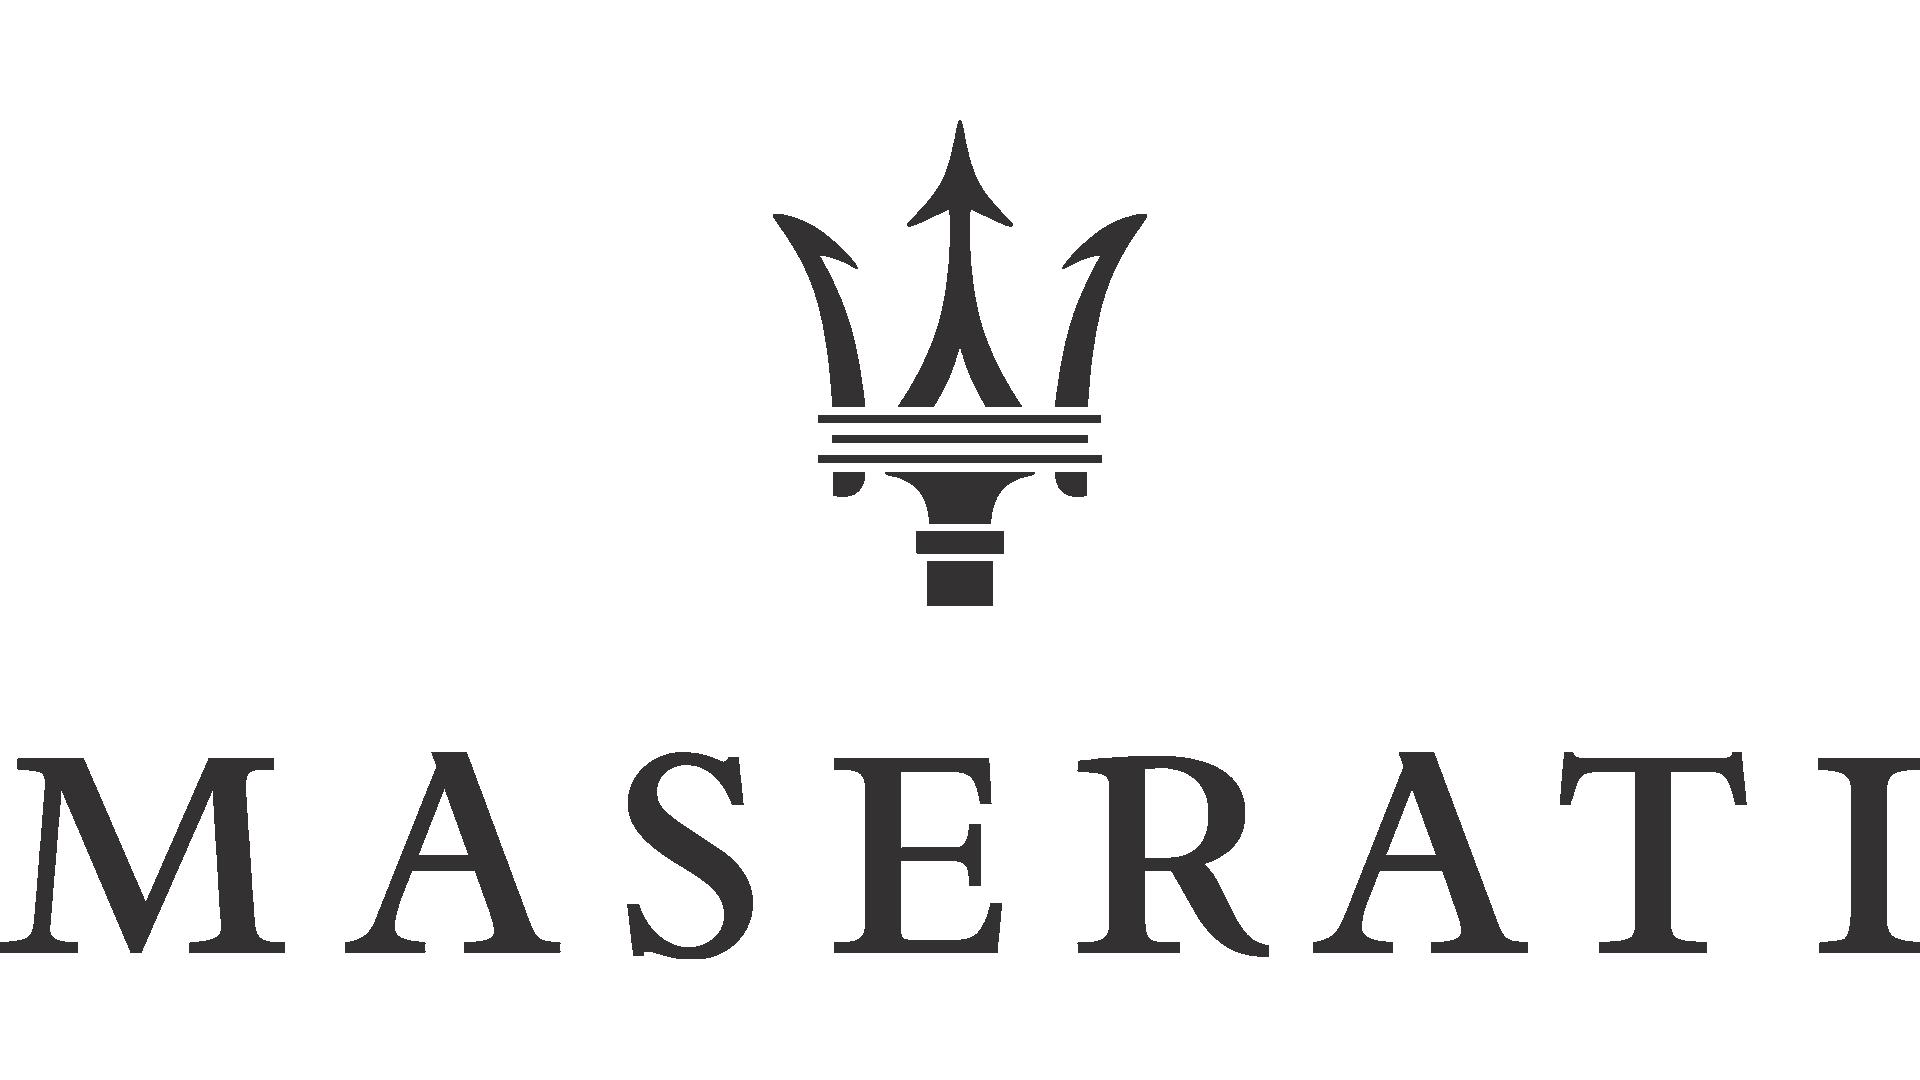 Maserati Logo (Present) 1920x1080 HD png